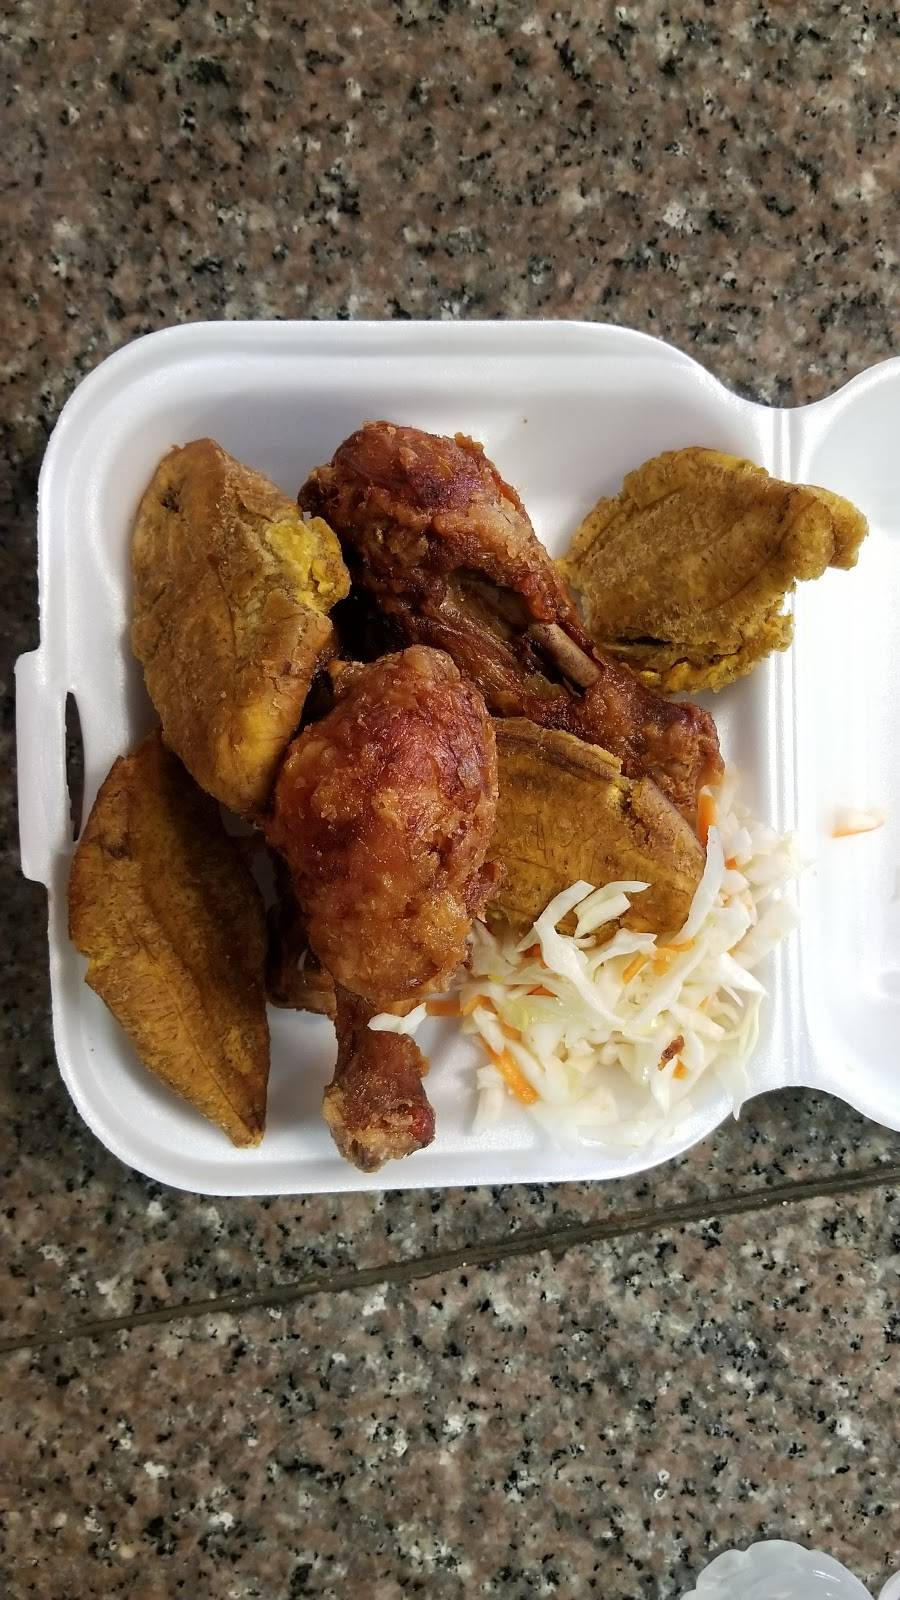 Pack Super Market | restaurant | 8235 NE 2nd Ave, Miami, FL 33138, USA | 3057574777 OR +1 305-757-4777